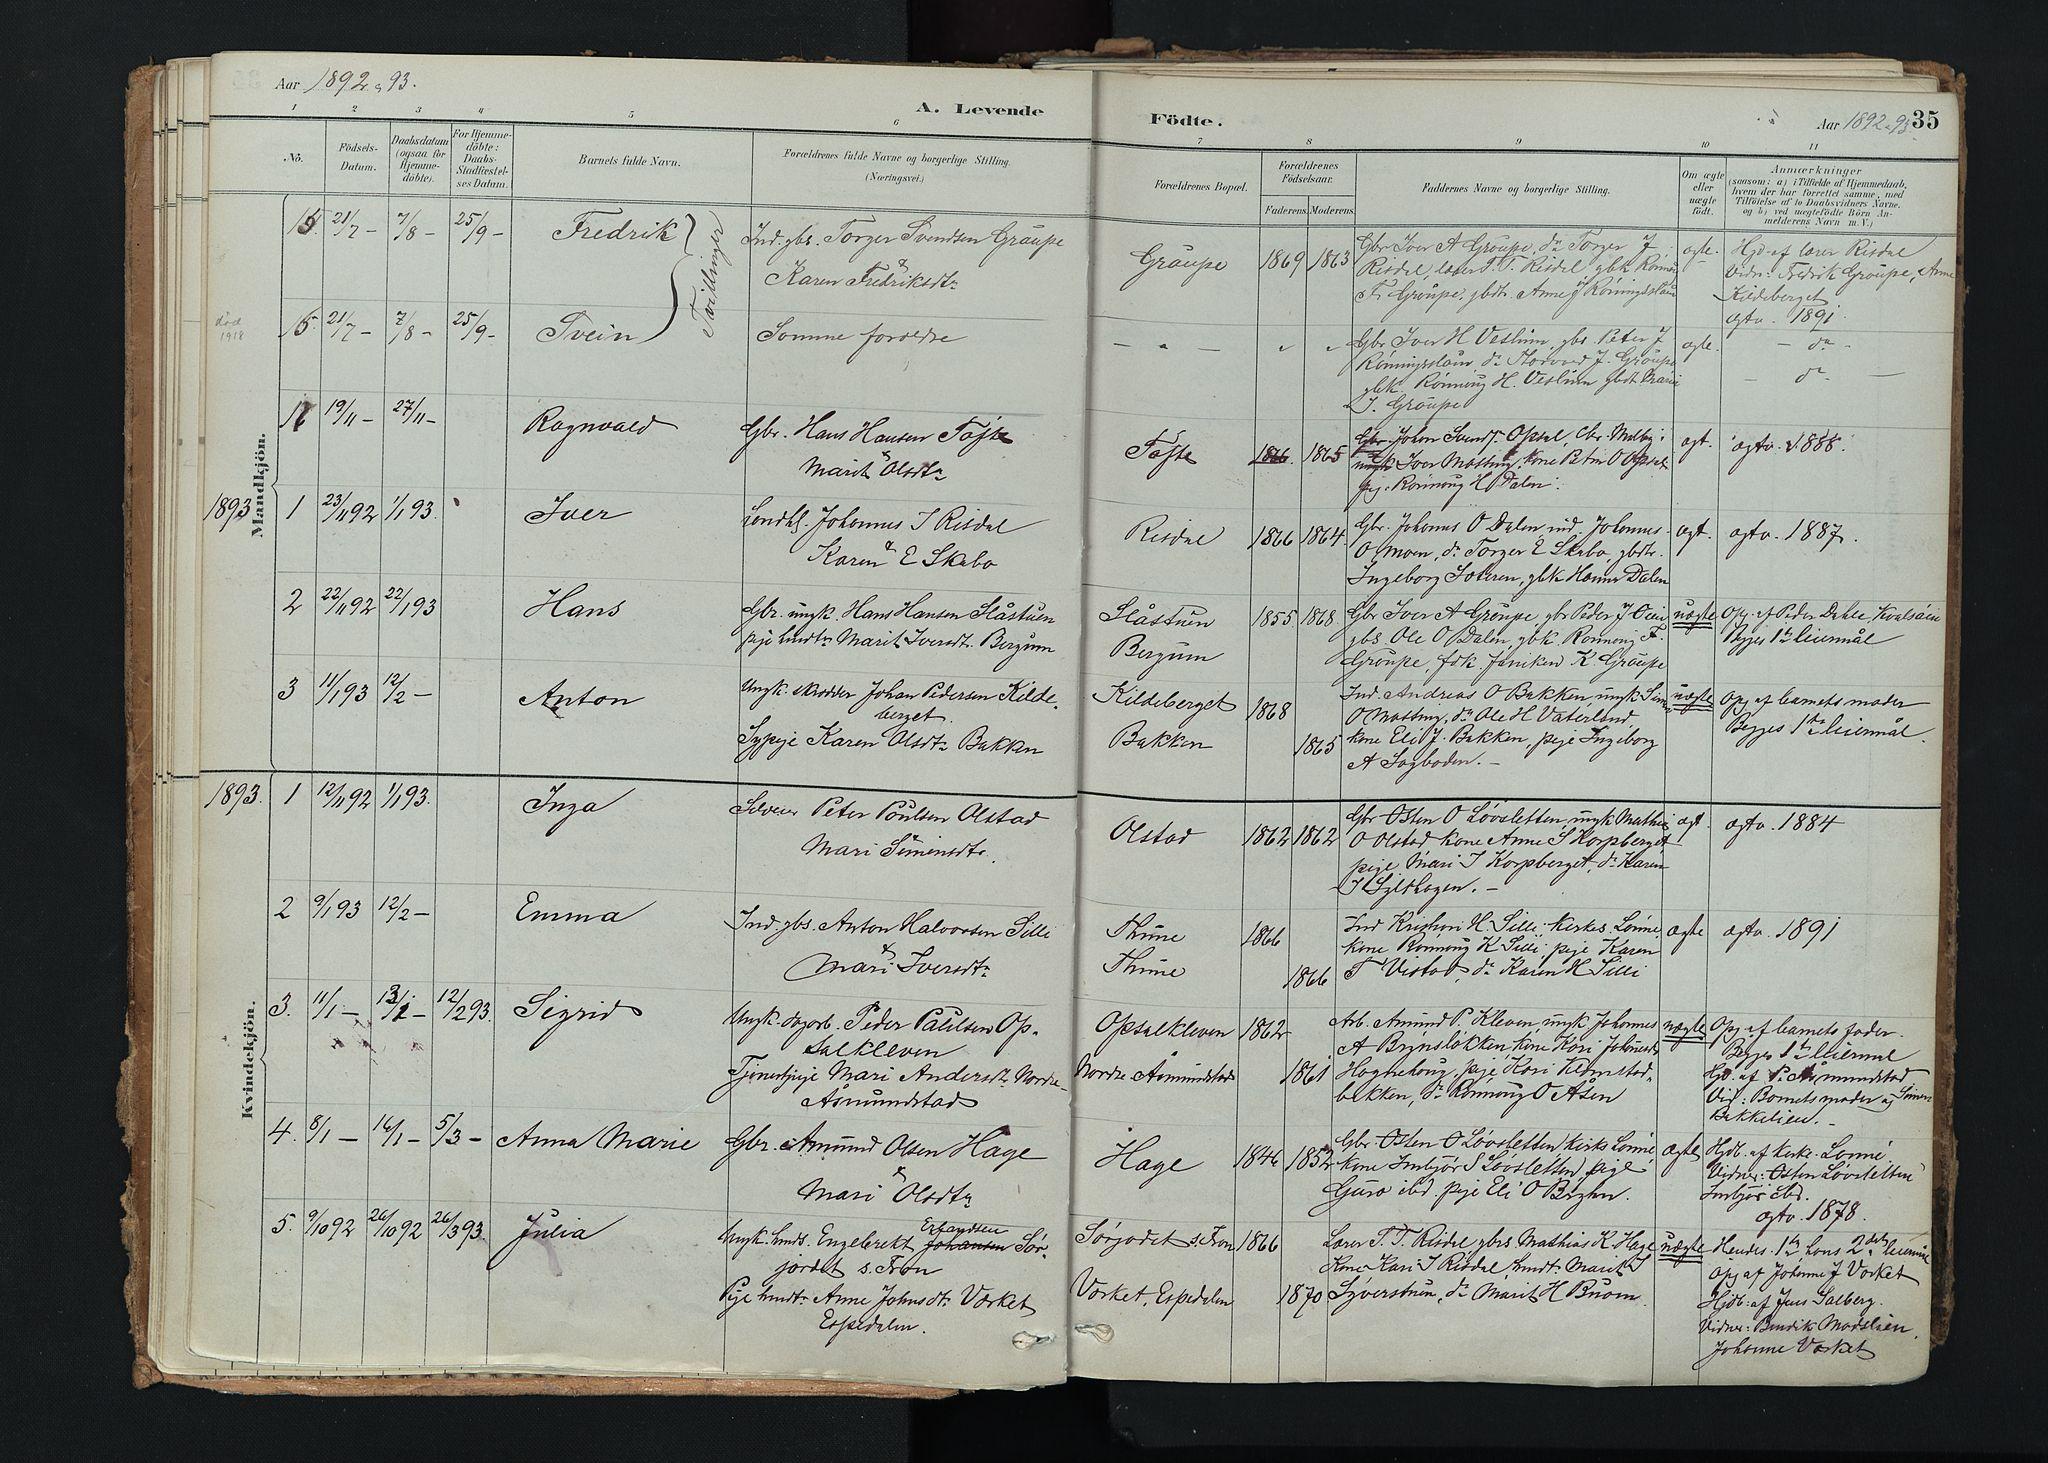 SAH, Nord-Fron prestekontor, Ministerialbok nr. 5, 1884-1914, s. 35